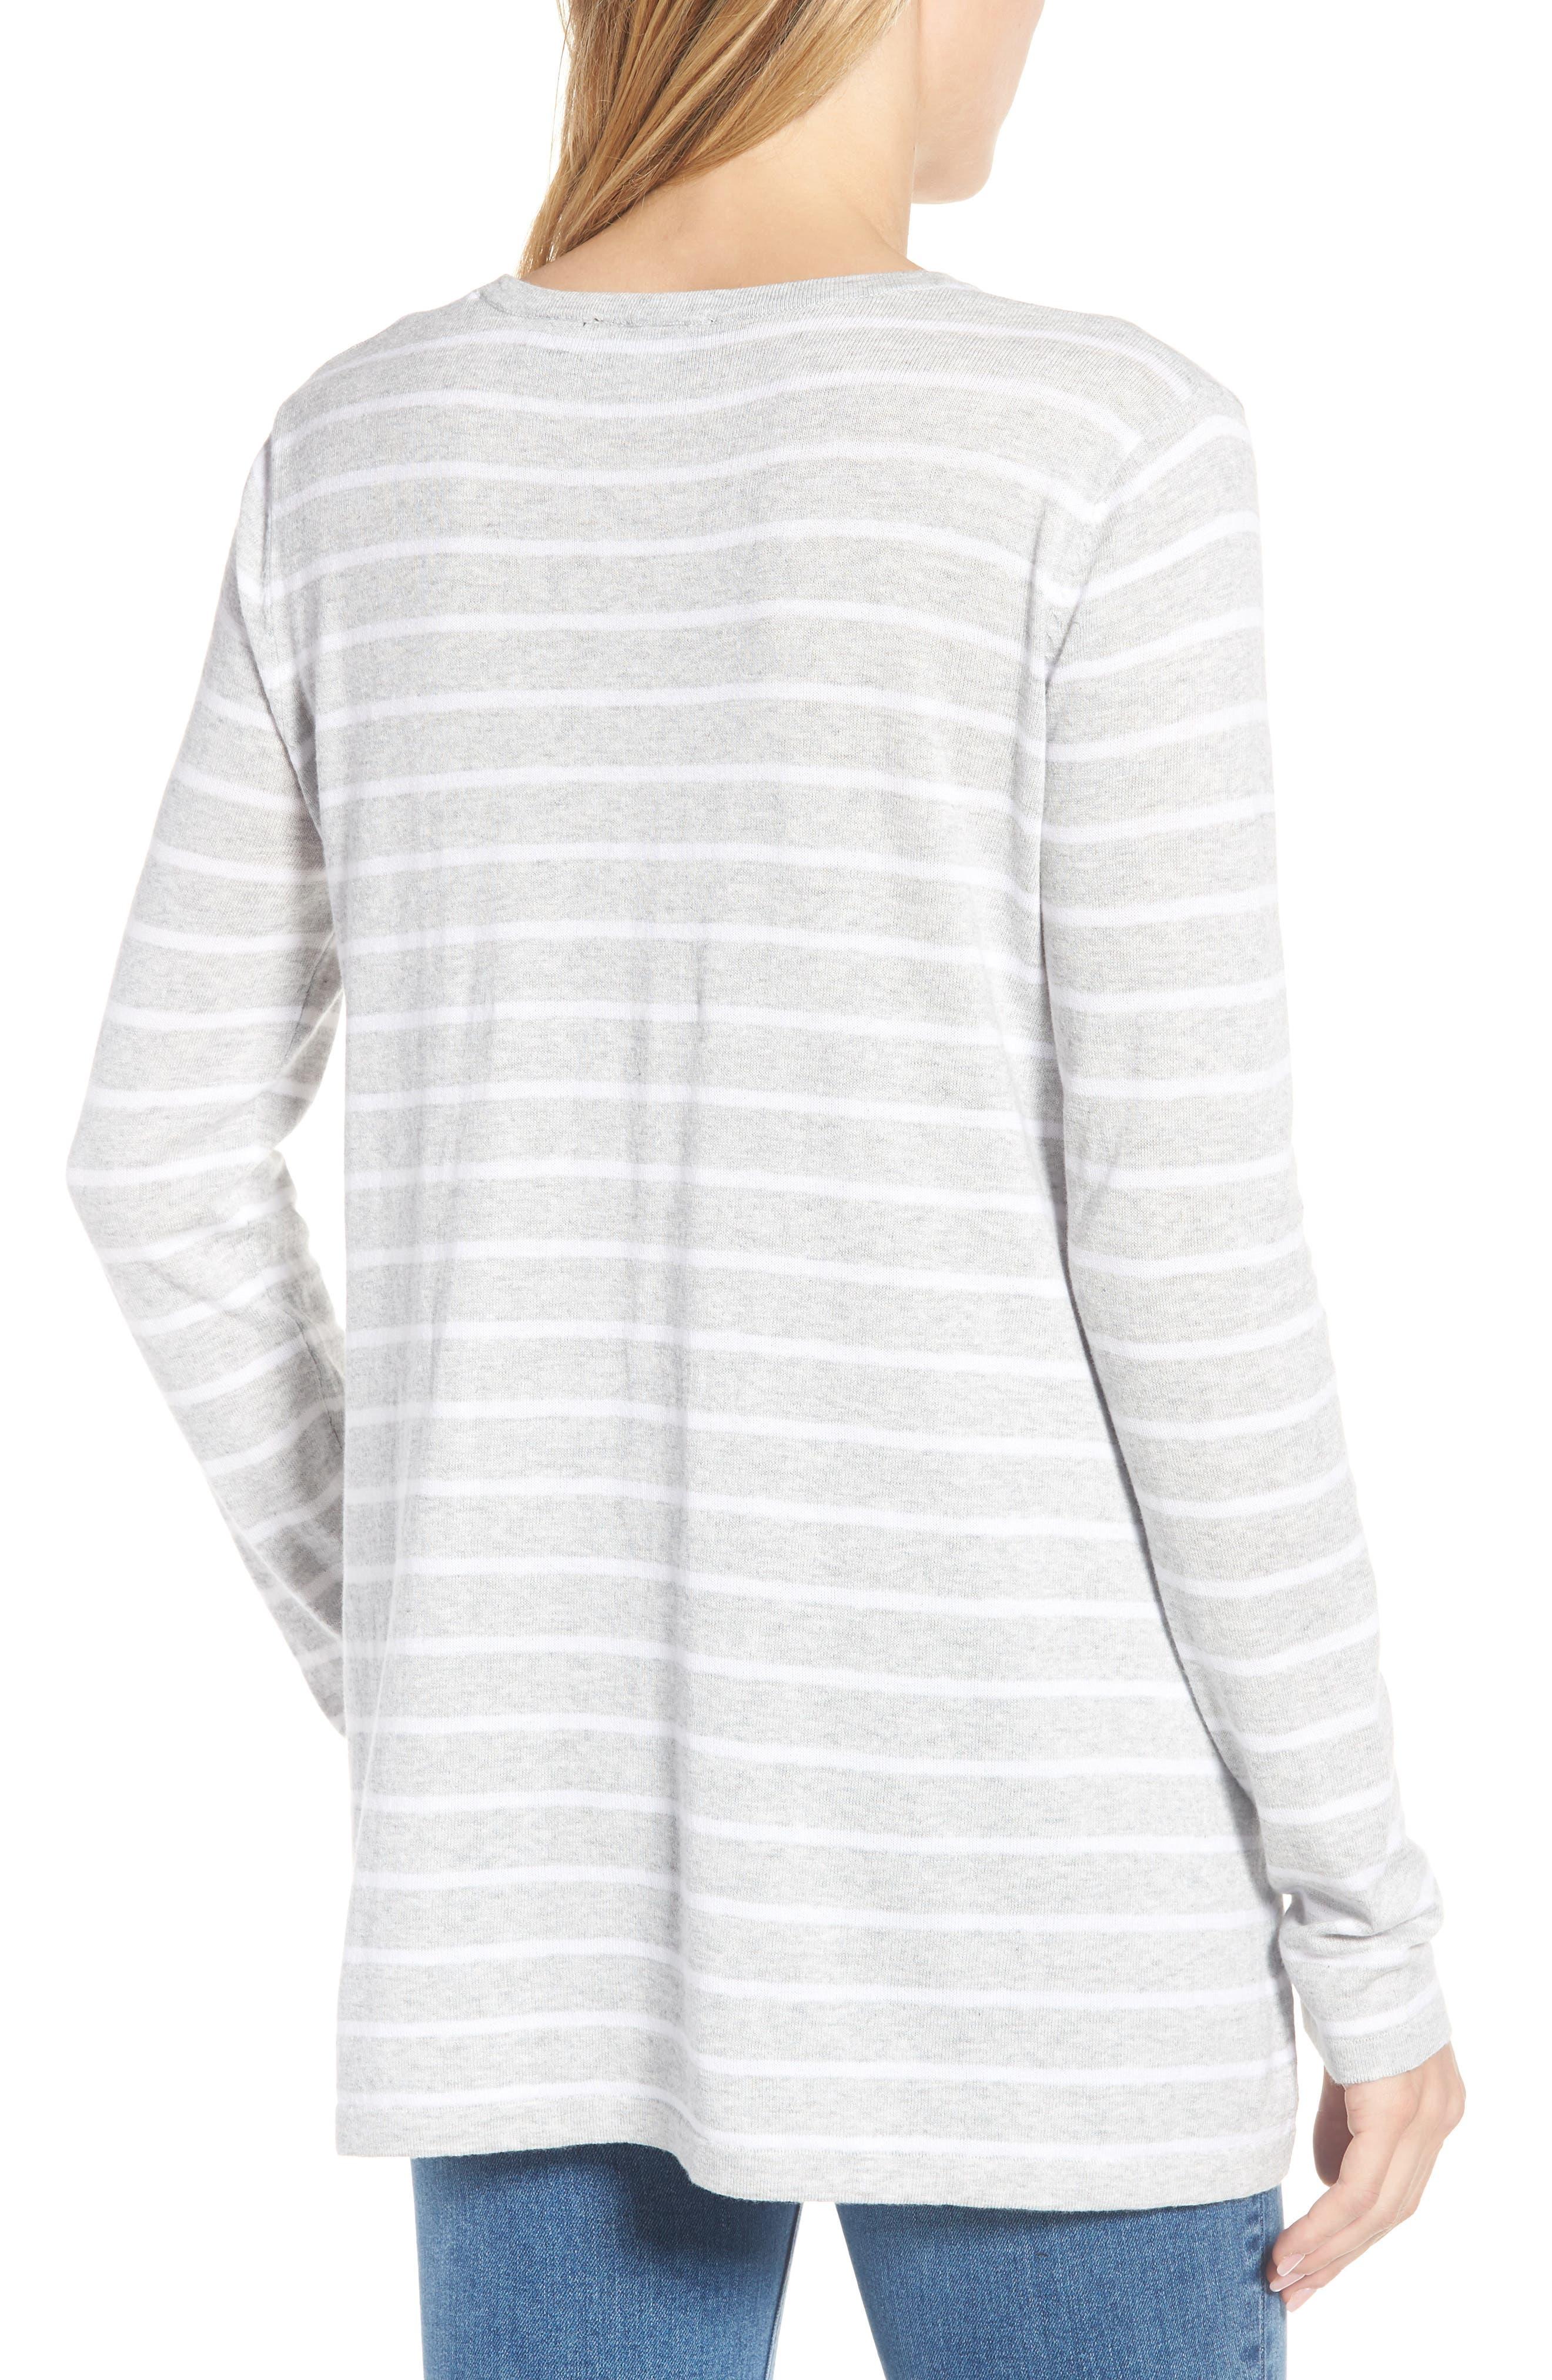 Cotton Blend Stripe Trapeze Cotton Blend Sweater,                             Alternate thumbnail 2, color,                             Pebble Grey Mix Warm White